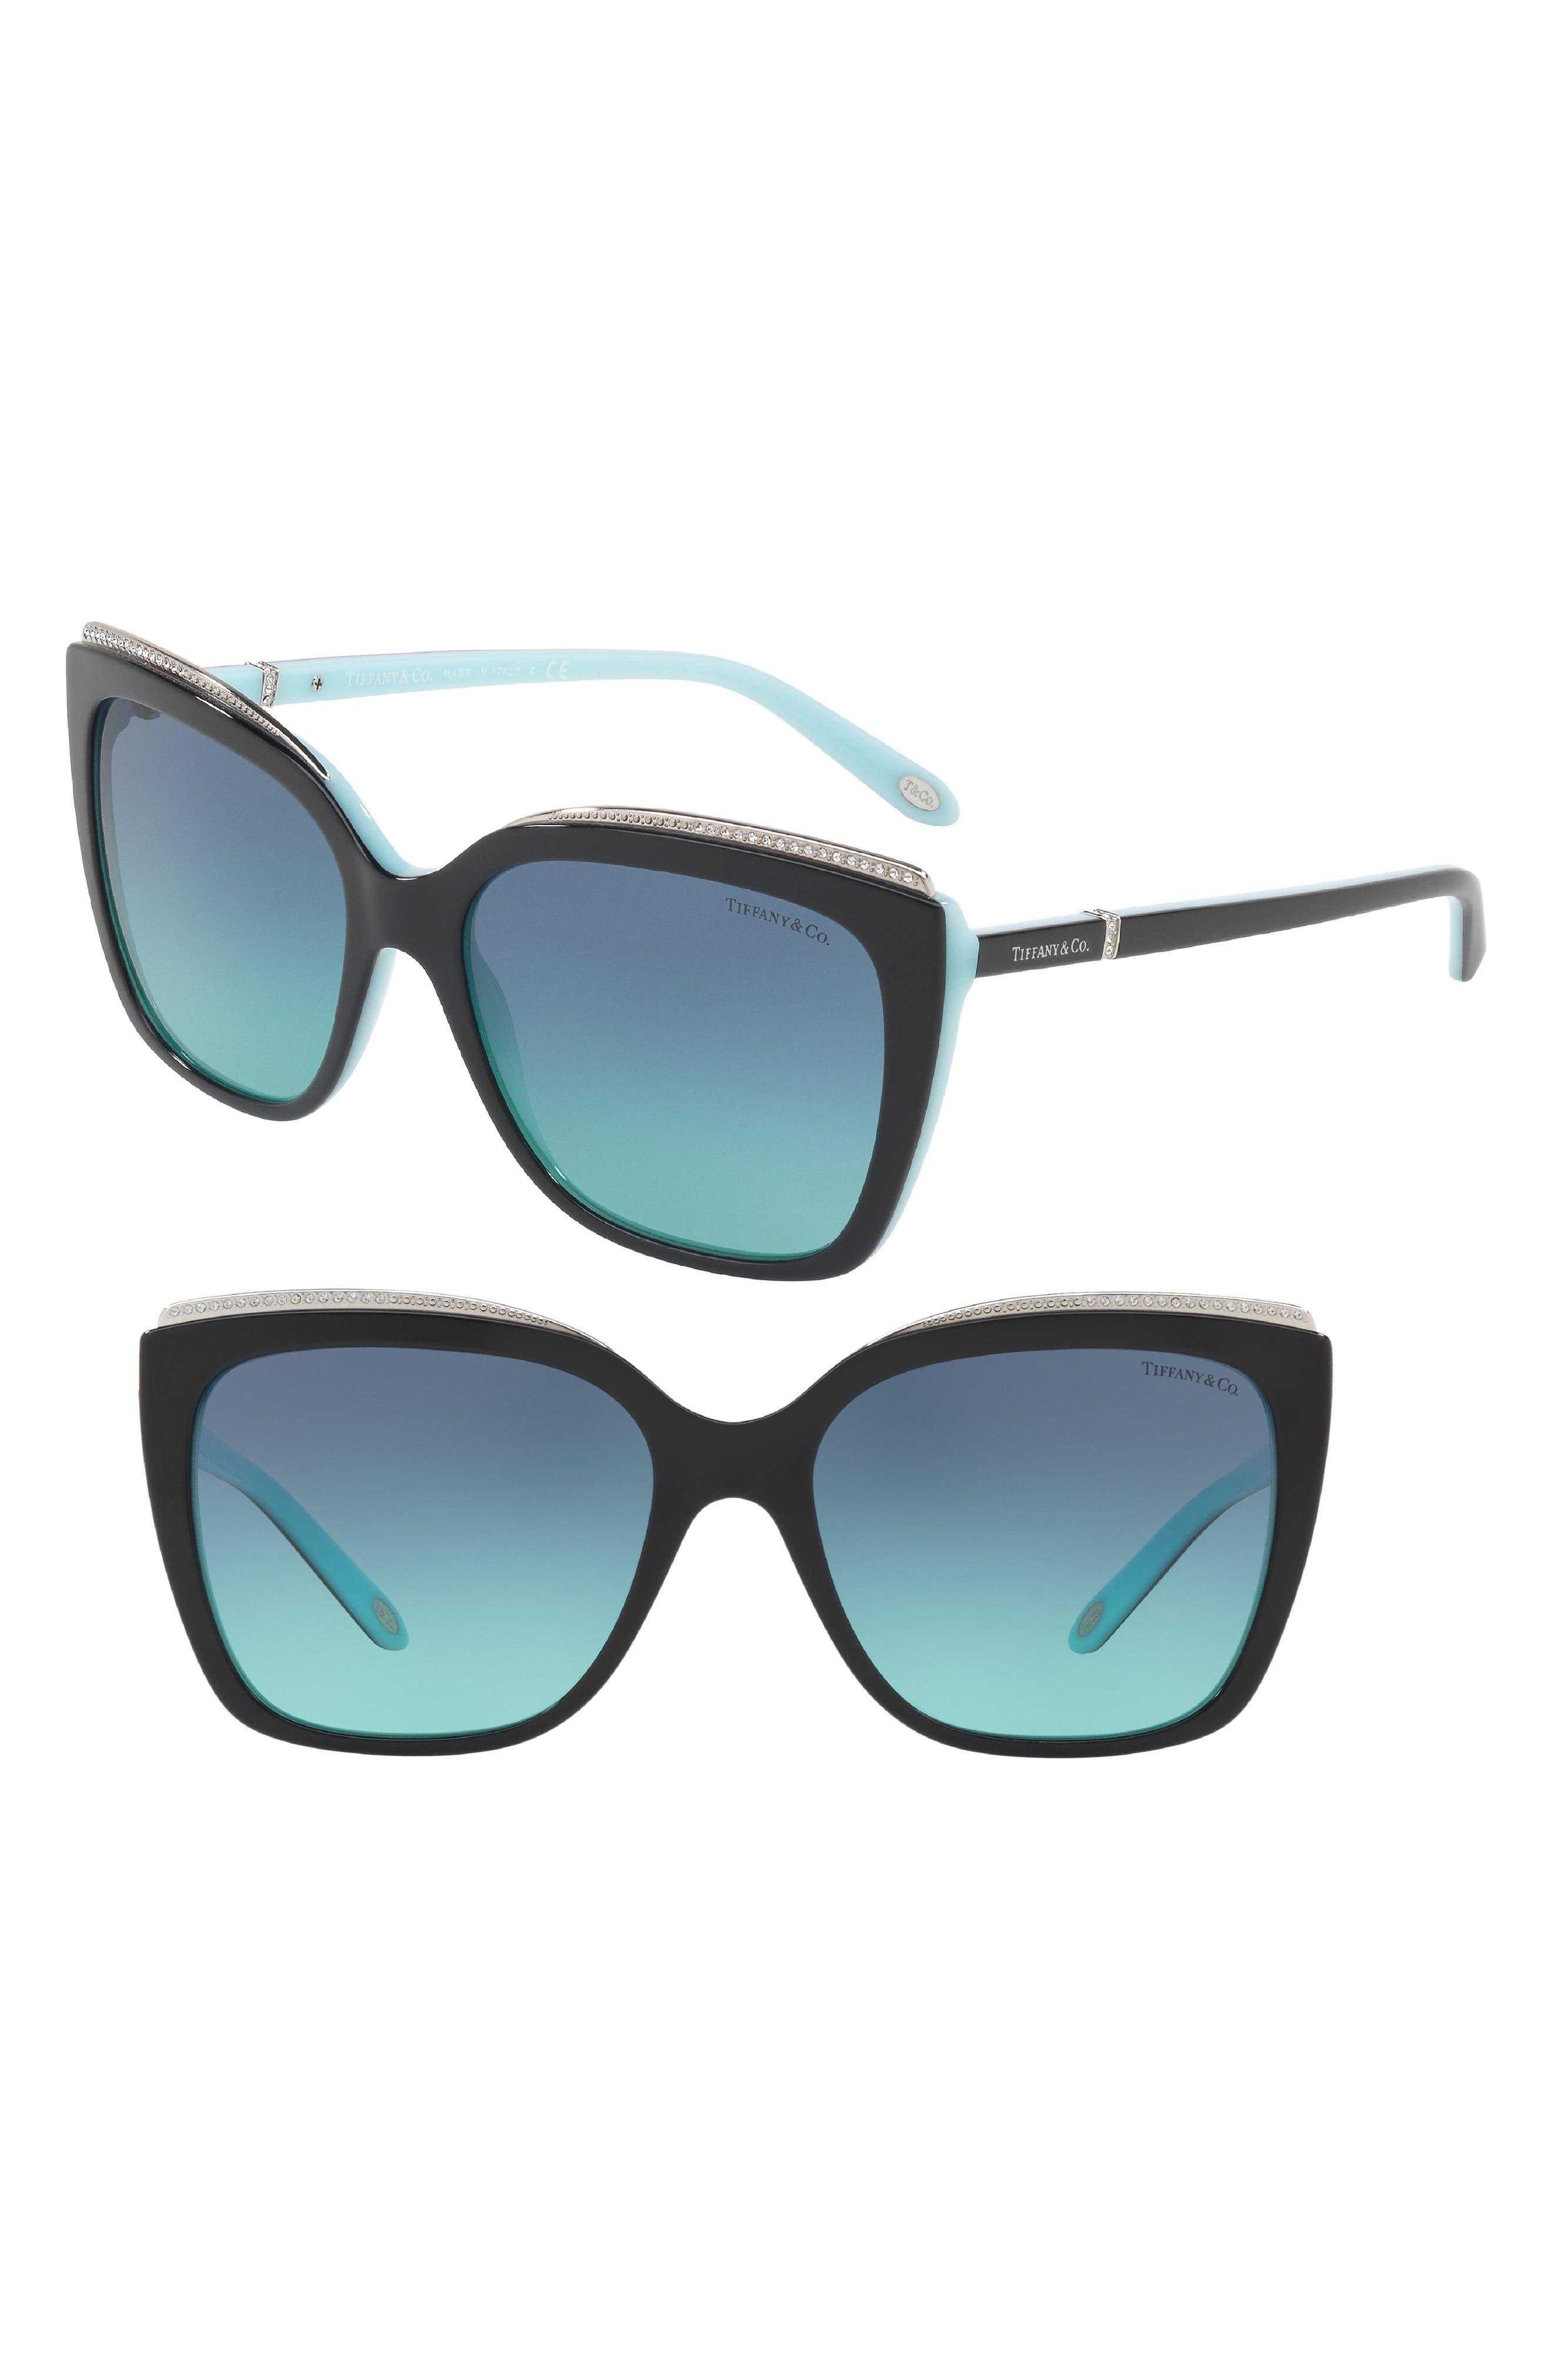 Tiffany 56mm Sunglasses,                         Main,                         color, Black/ Blue